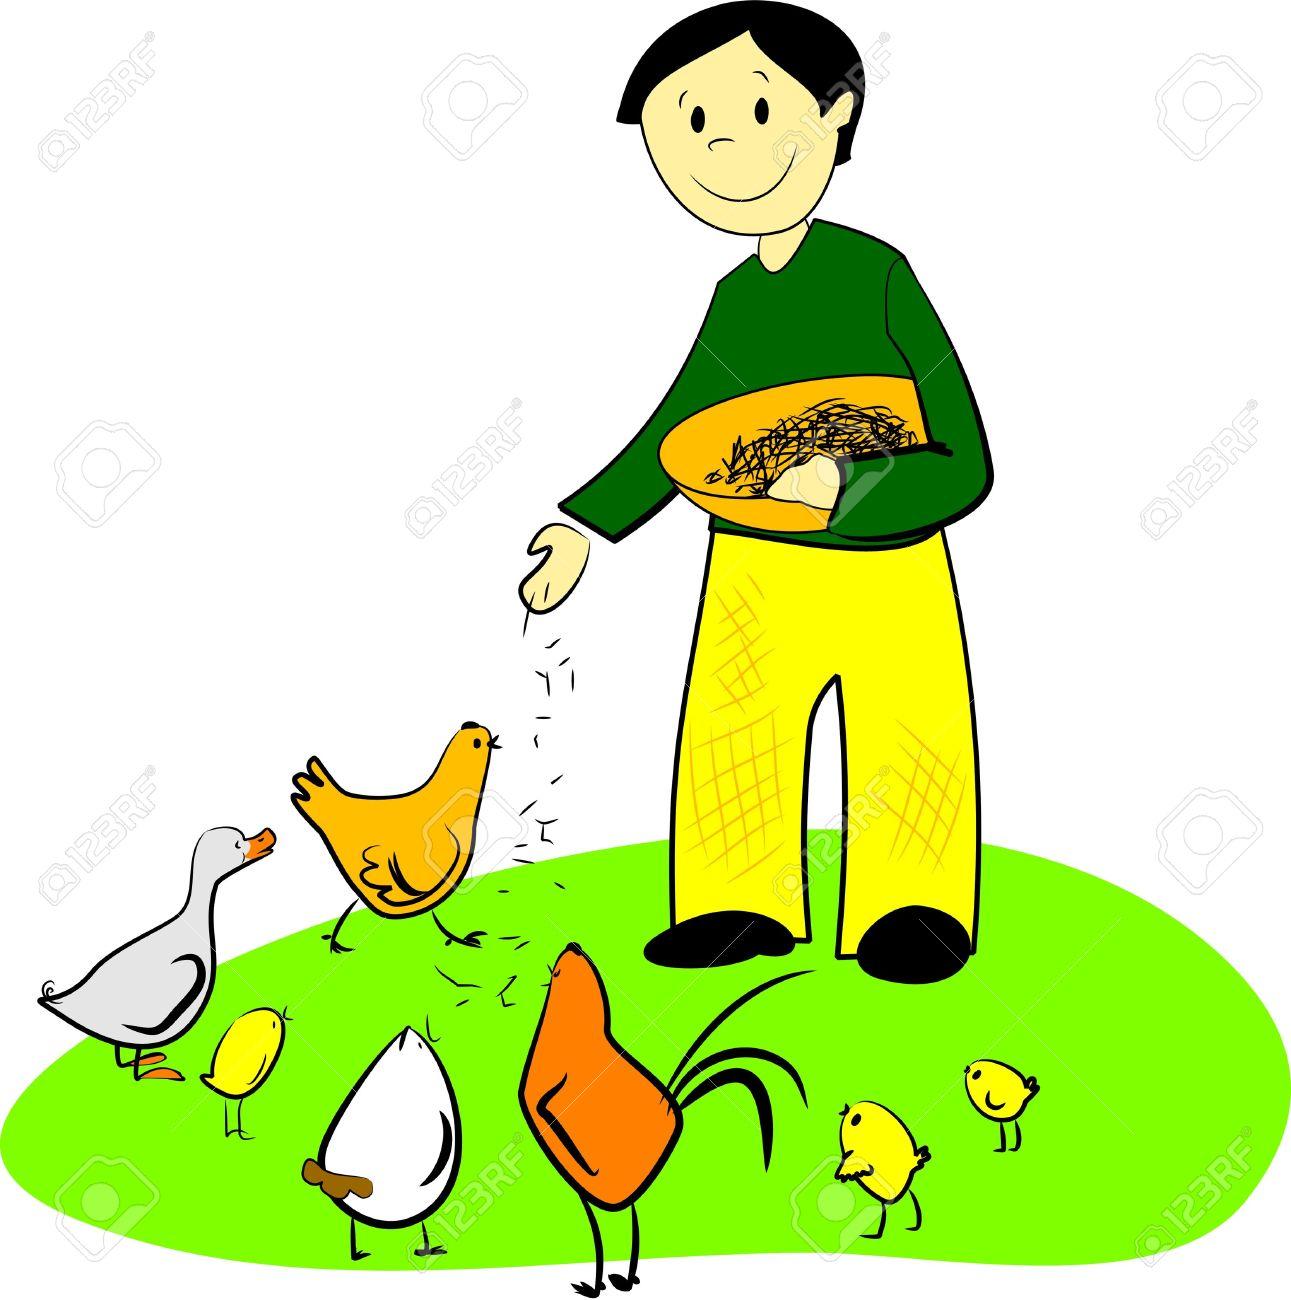 Birdfeeding clipart #8, Download drawings